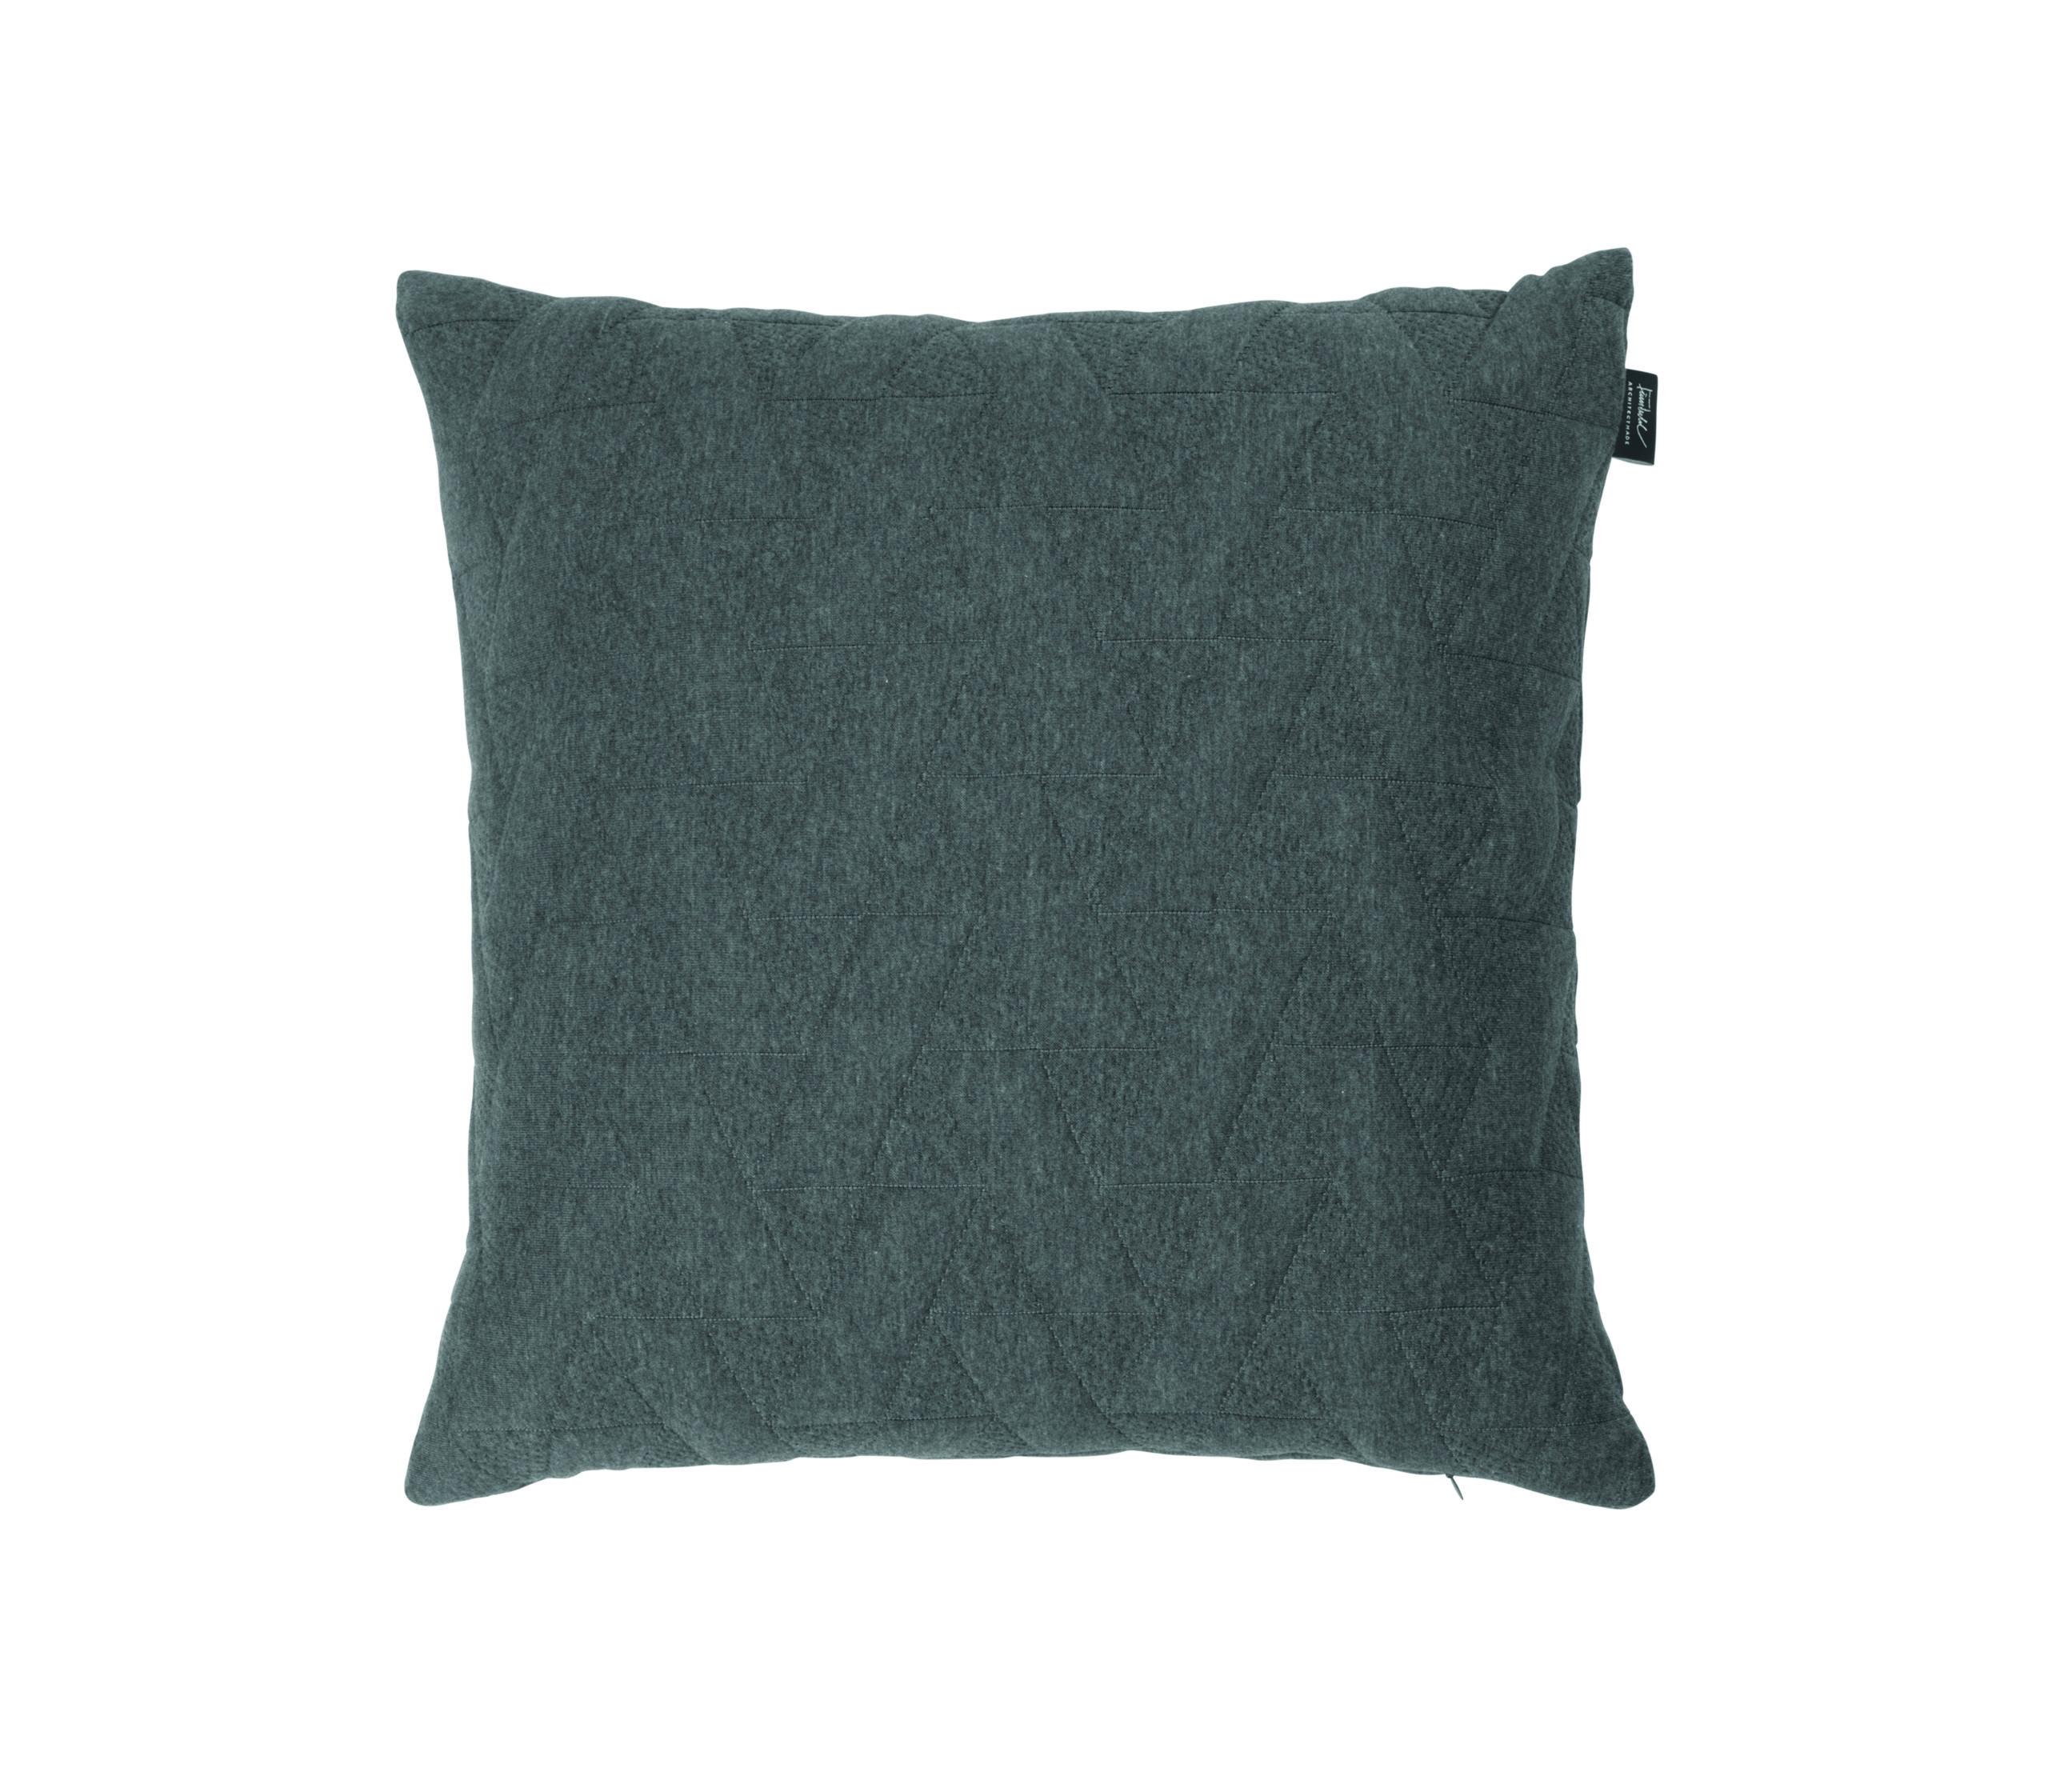 Architectmade-FJ-Pattern-50x50-Pillow-Grey-Organic-Cotton-Finn-Juhl